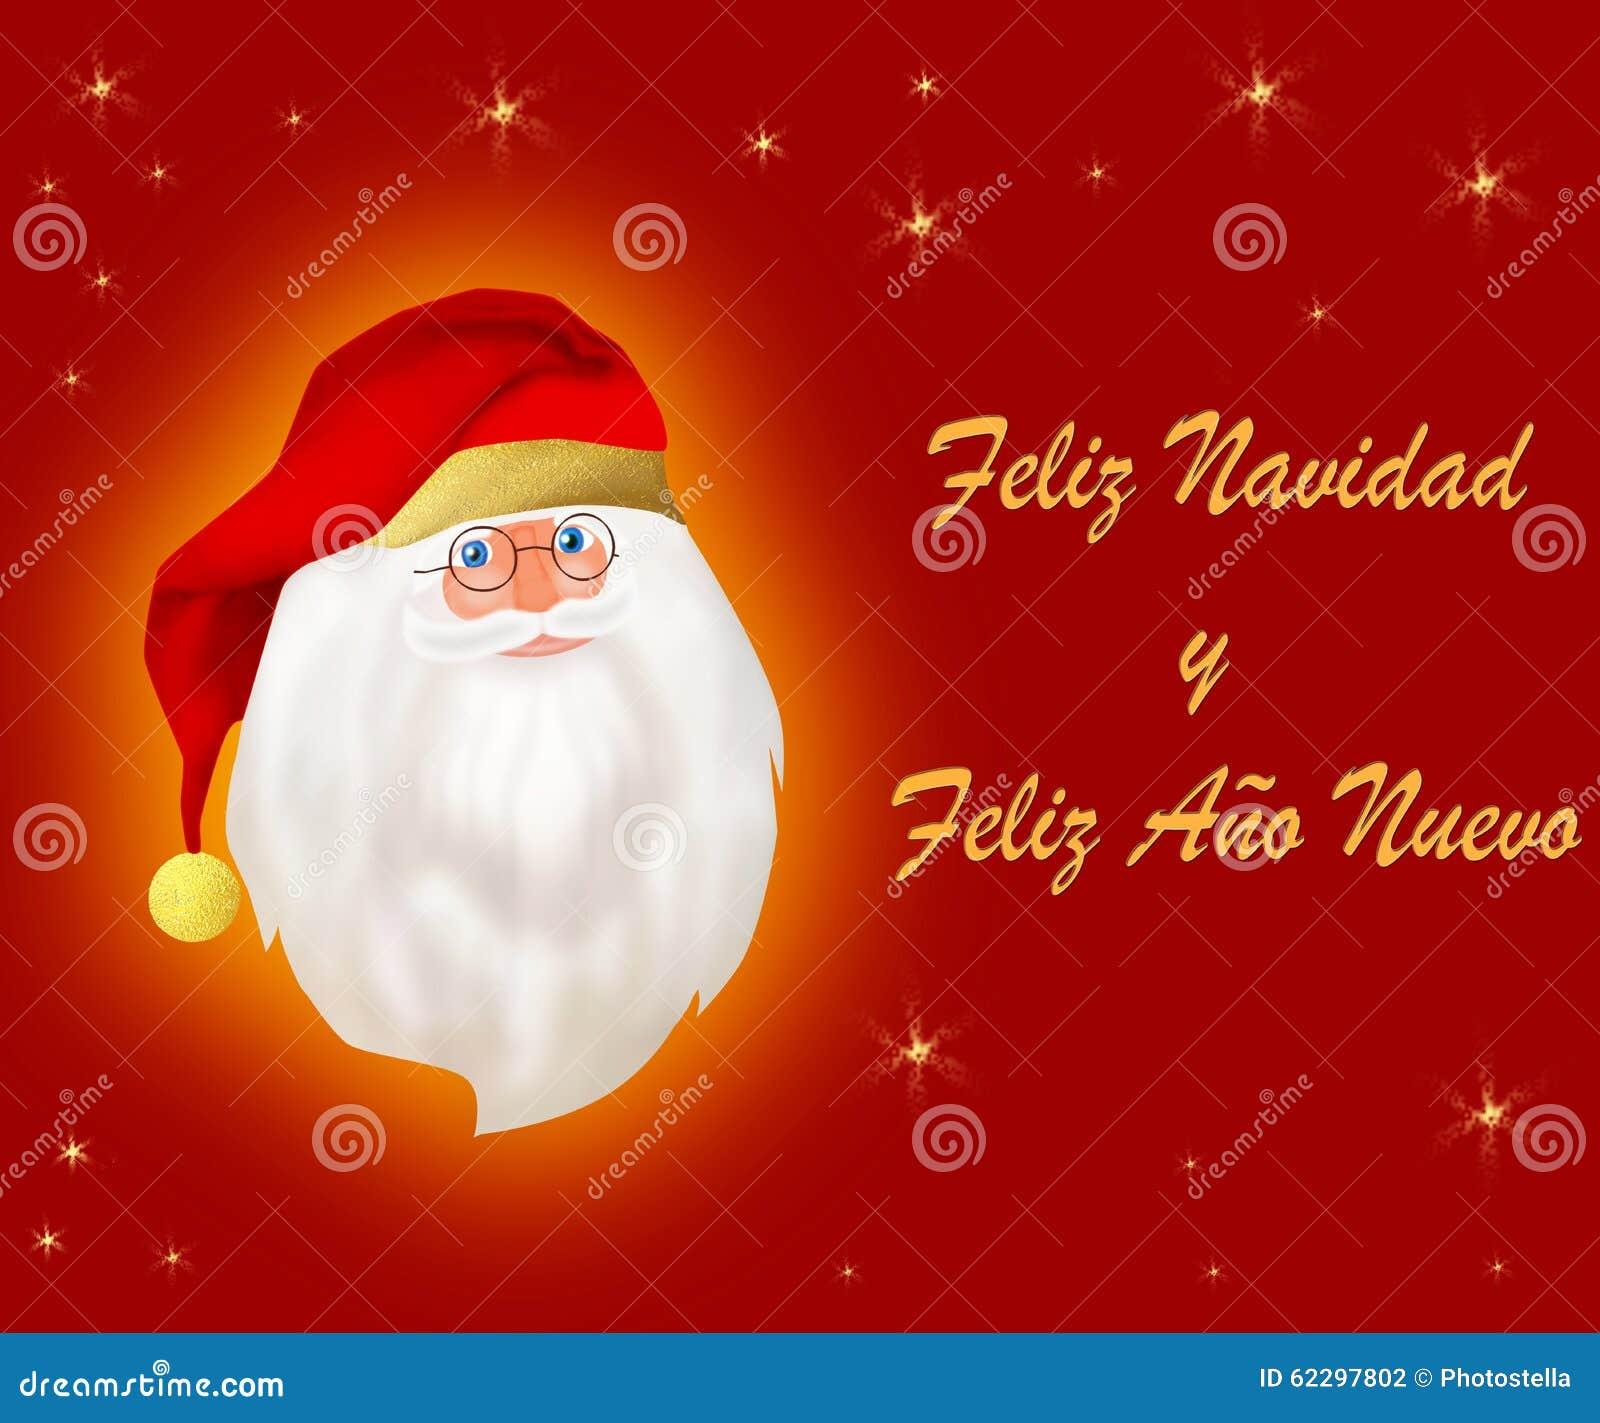 Spanish christmas card stock illustration image 62297802